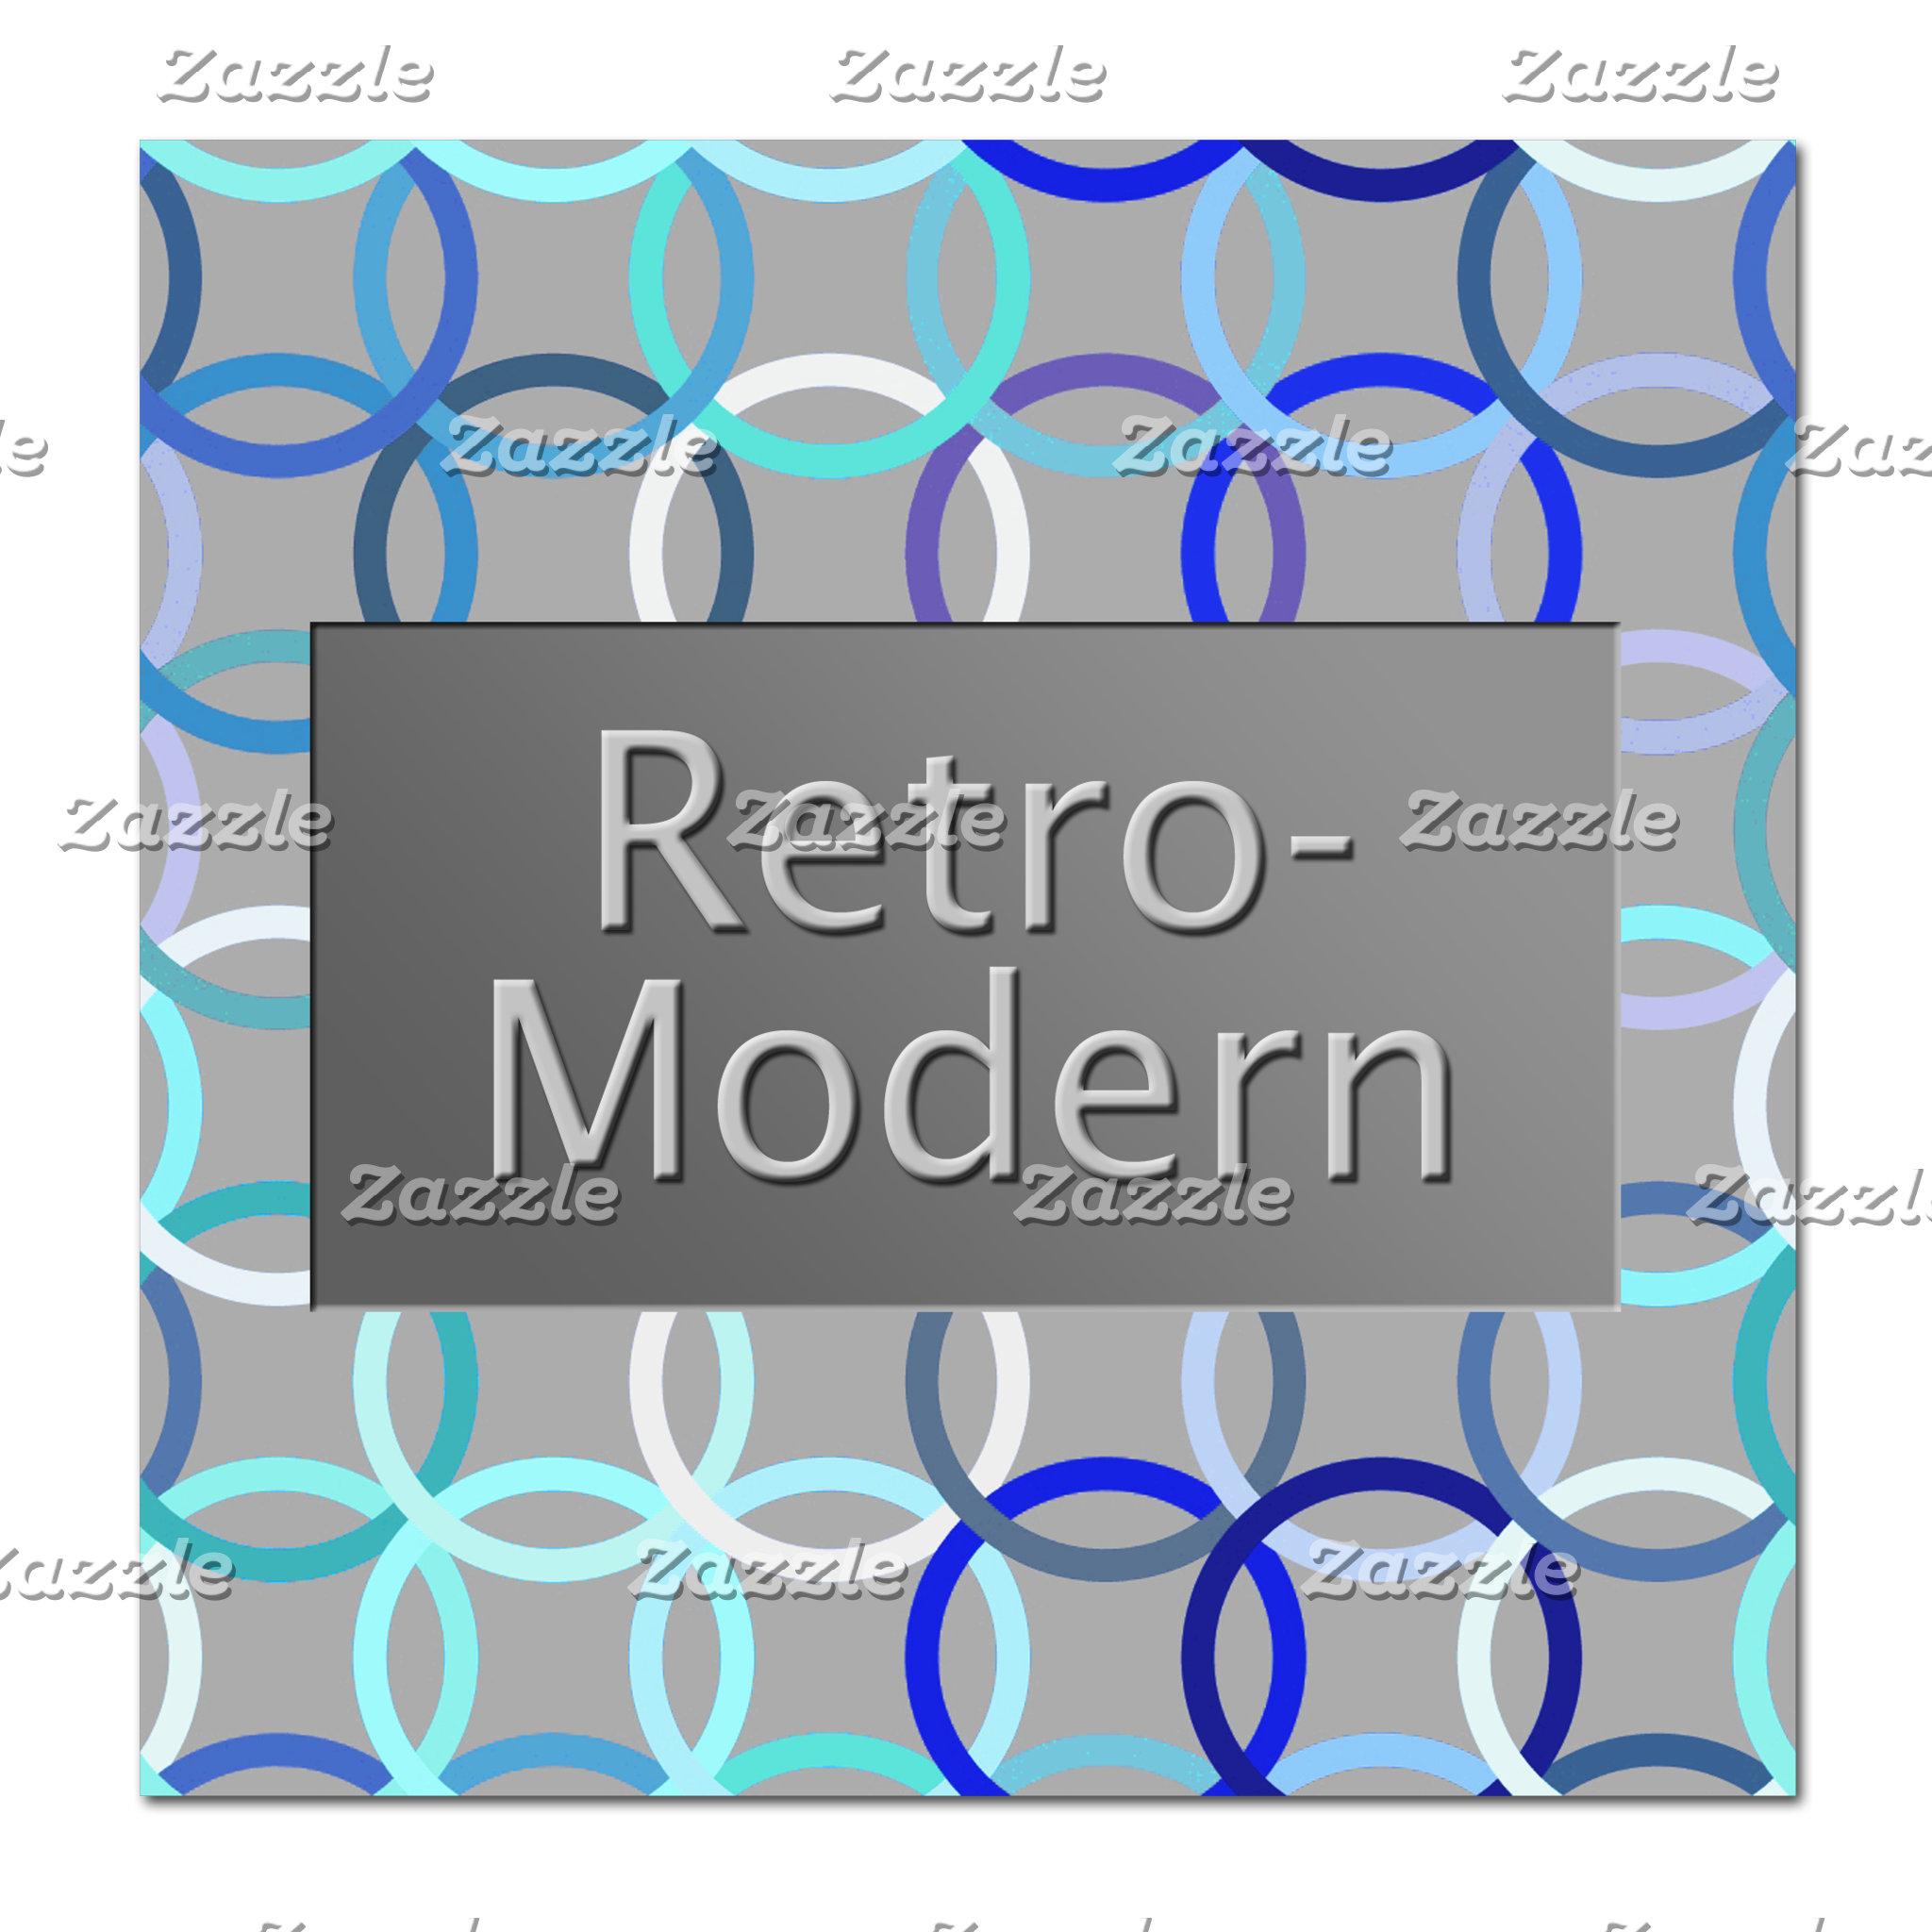 Retro-Modern